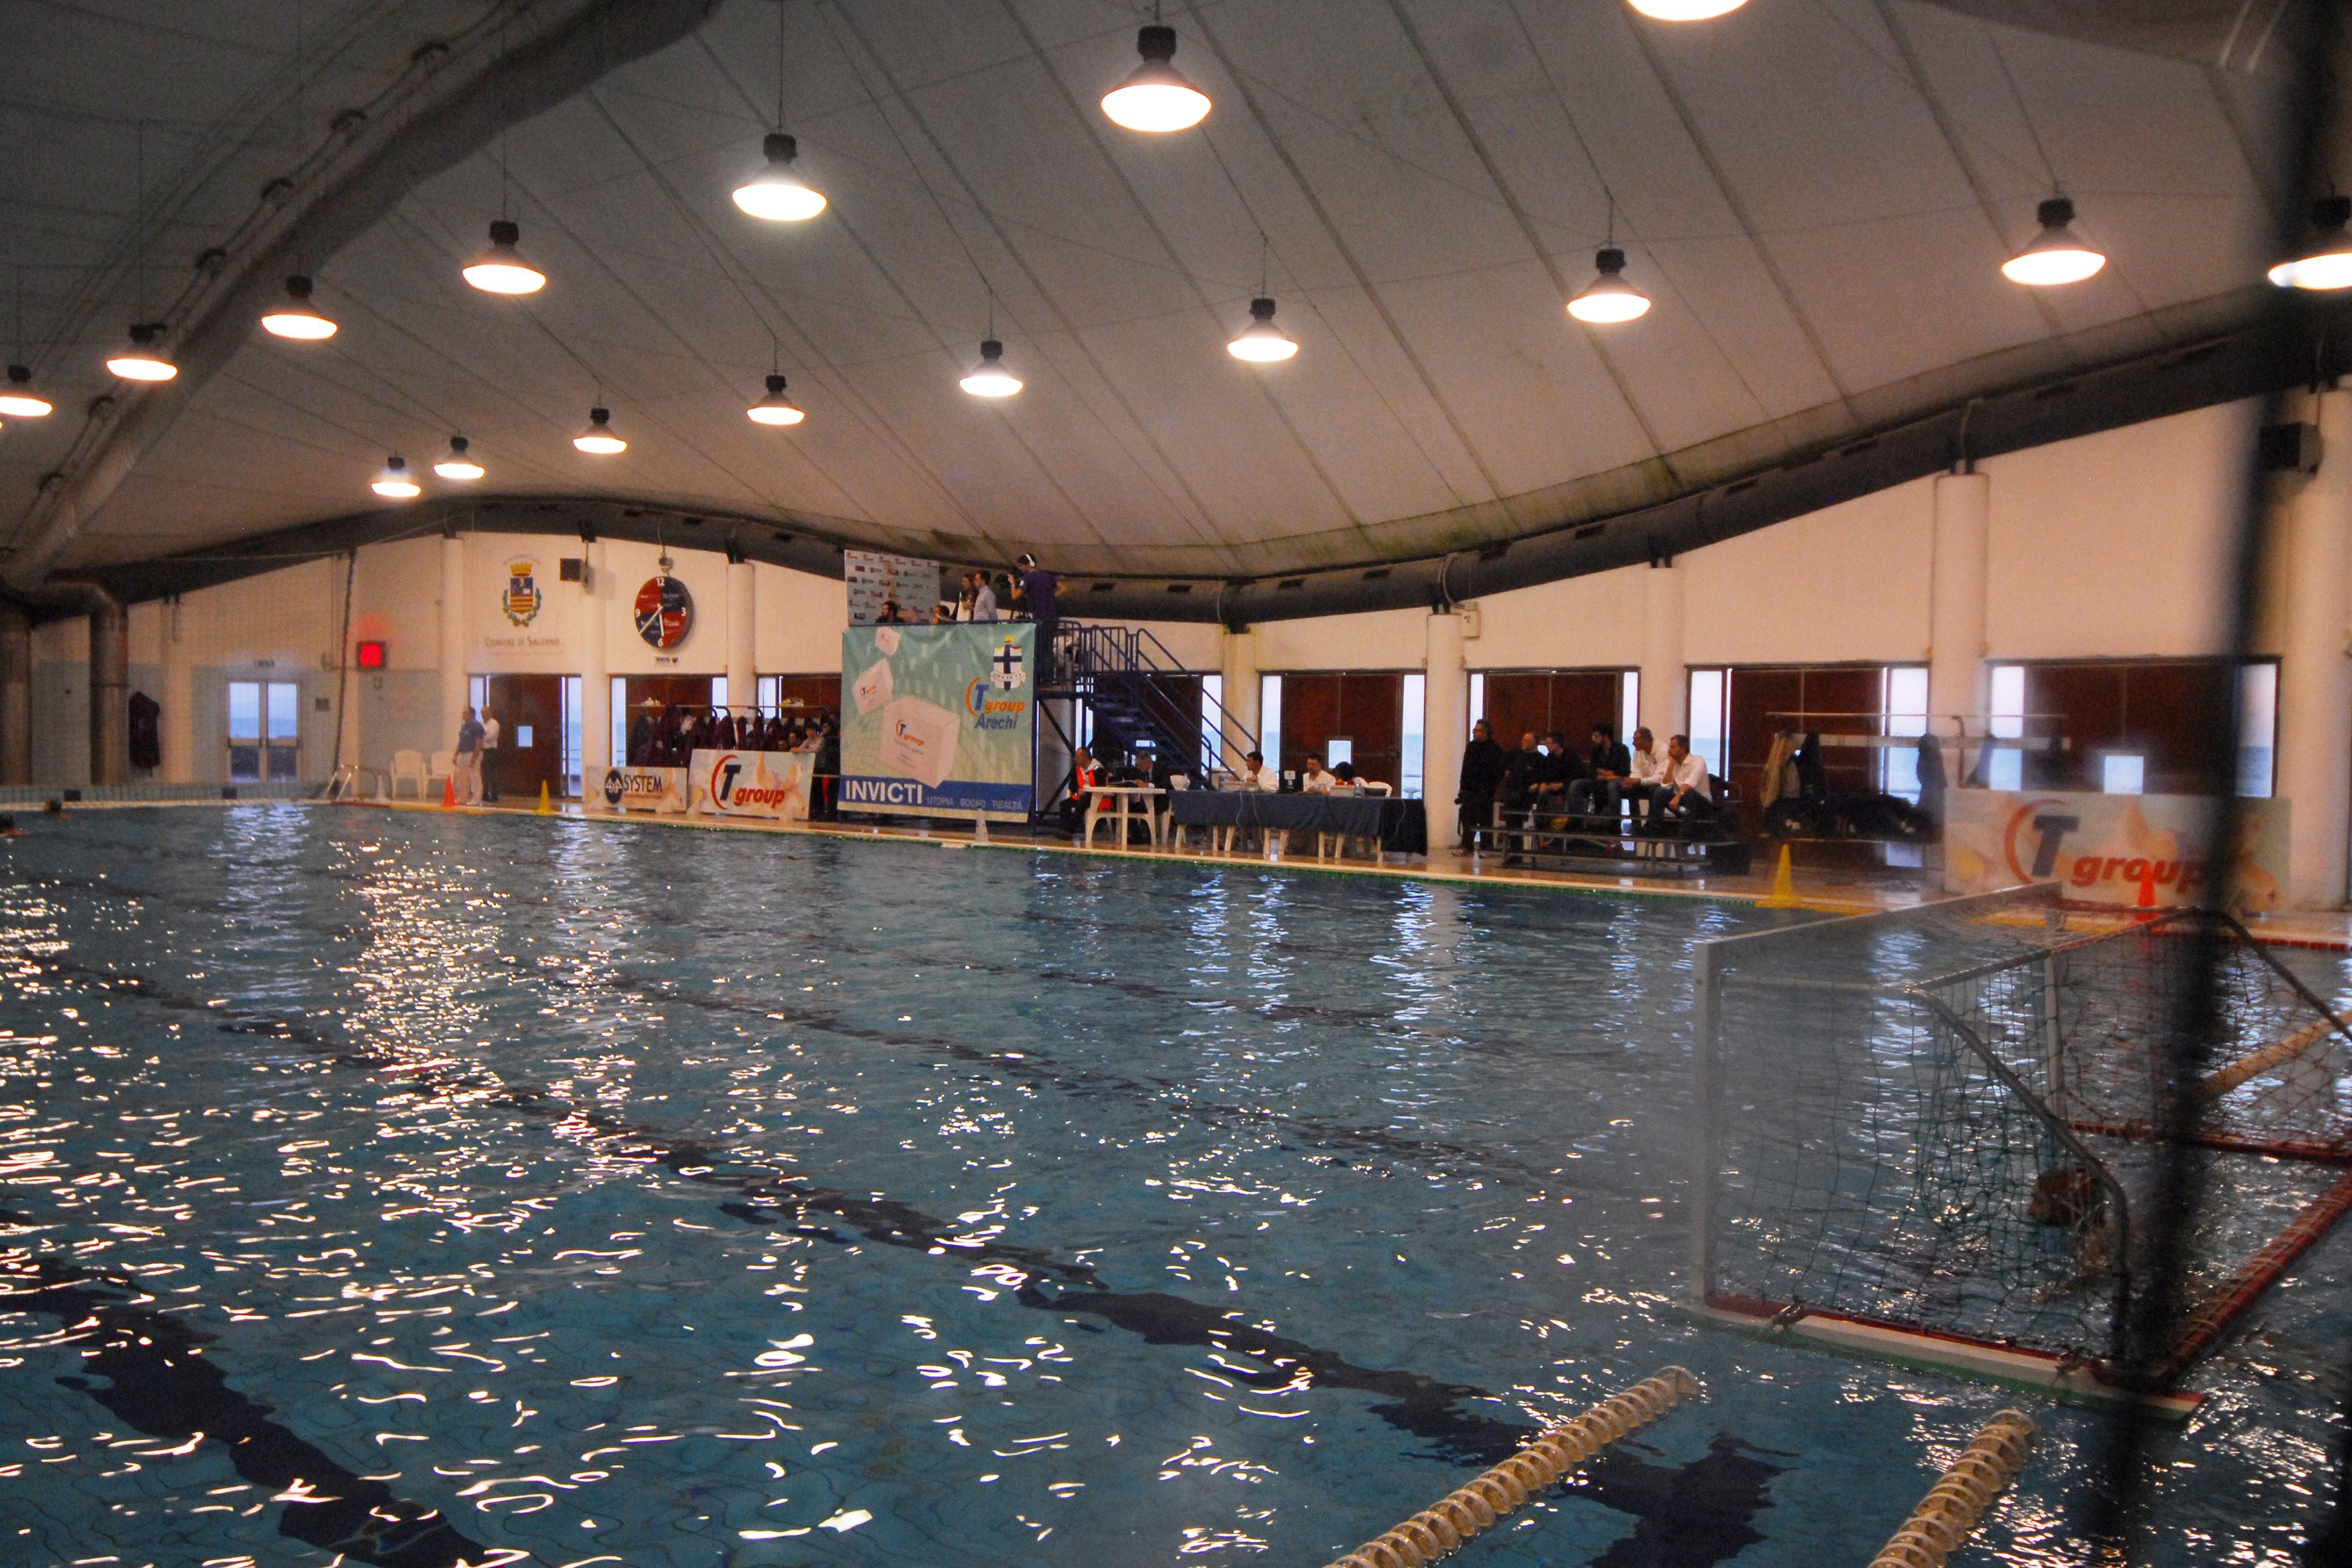 Piscine A Nocera Inferiore piscina vitale vuota - tvoggi salerno